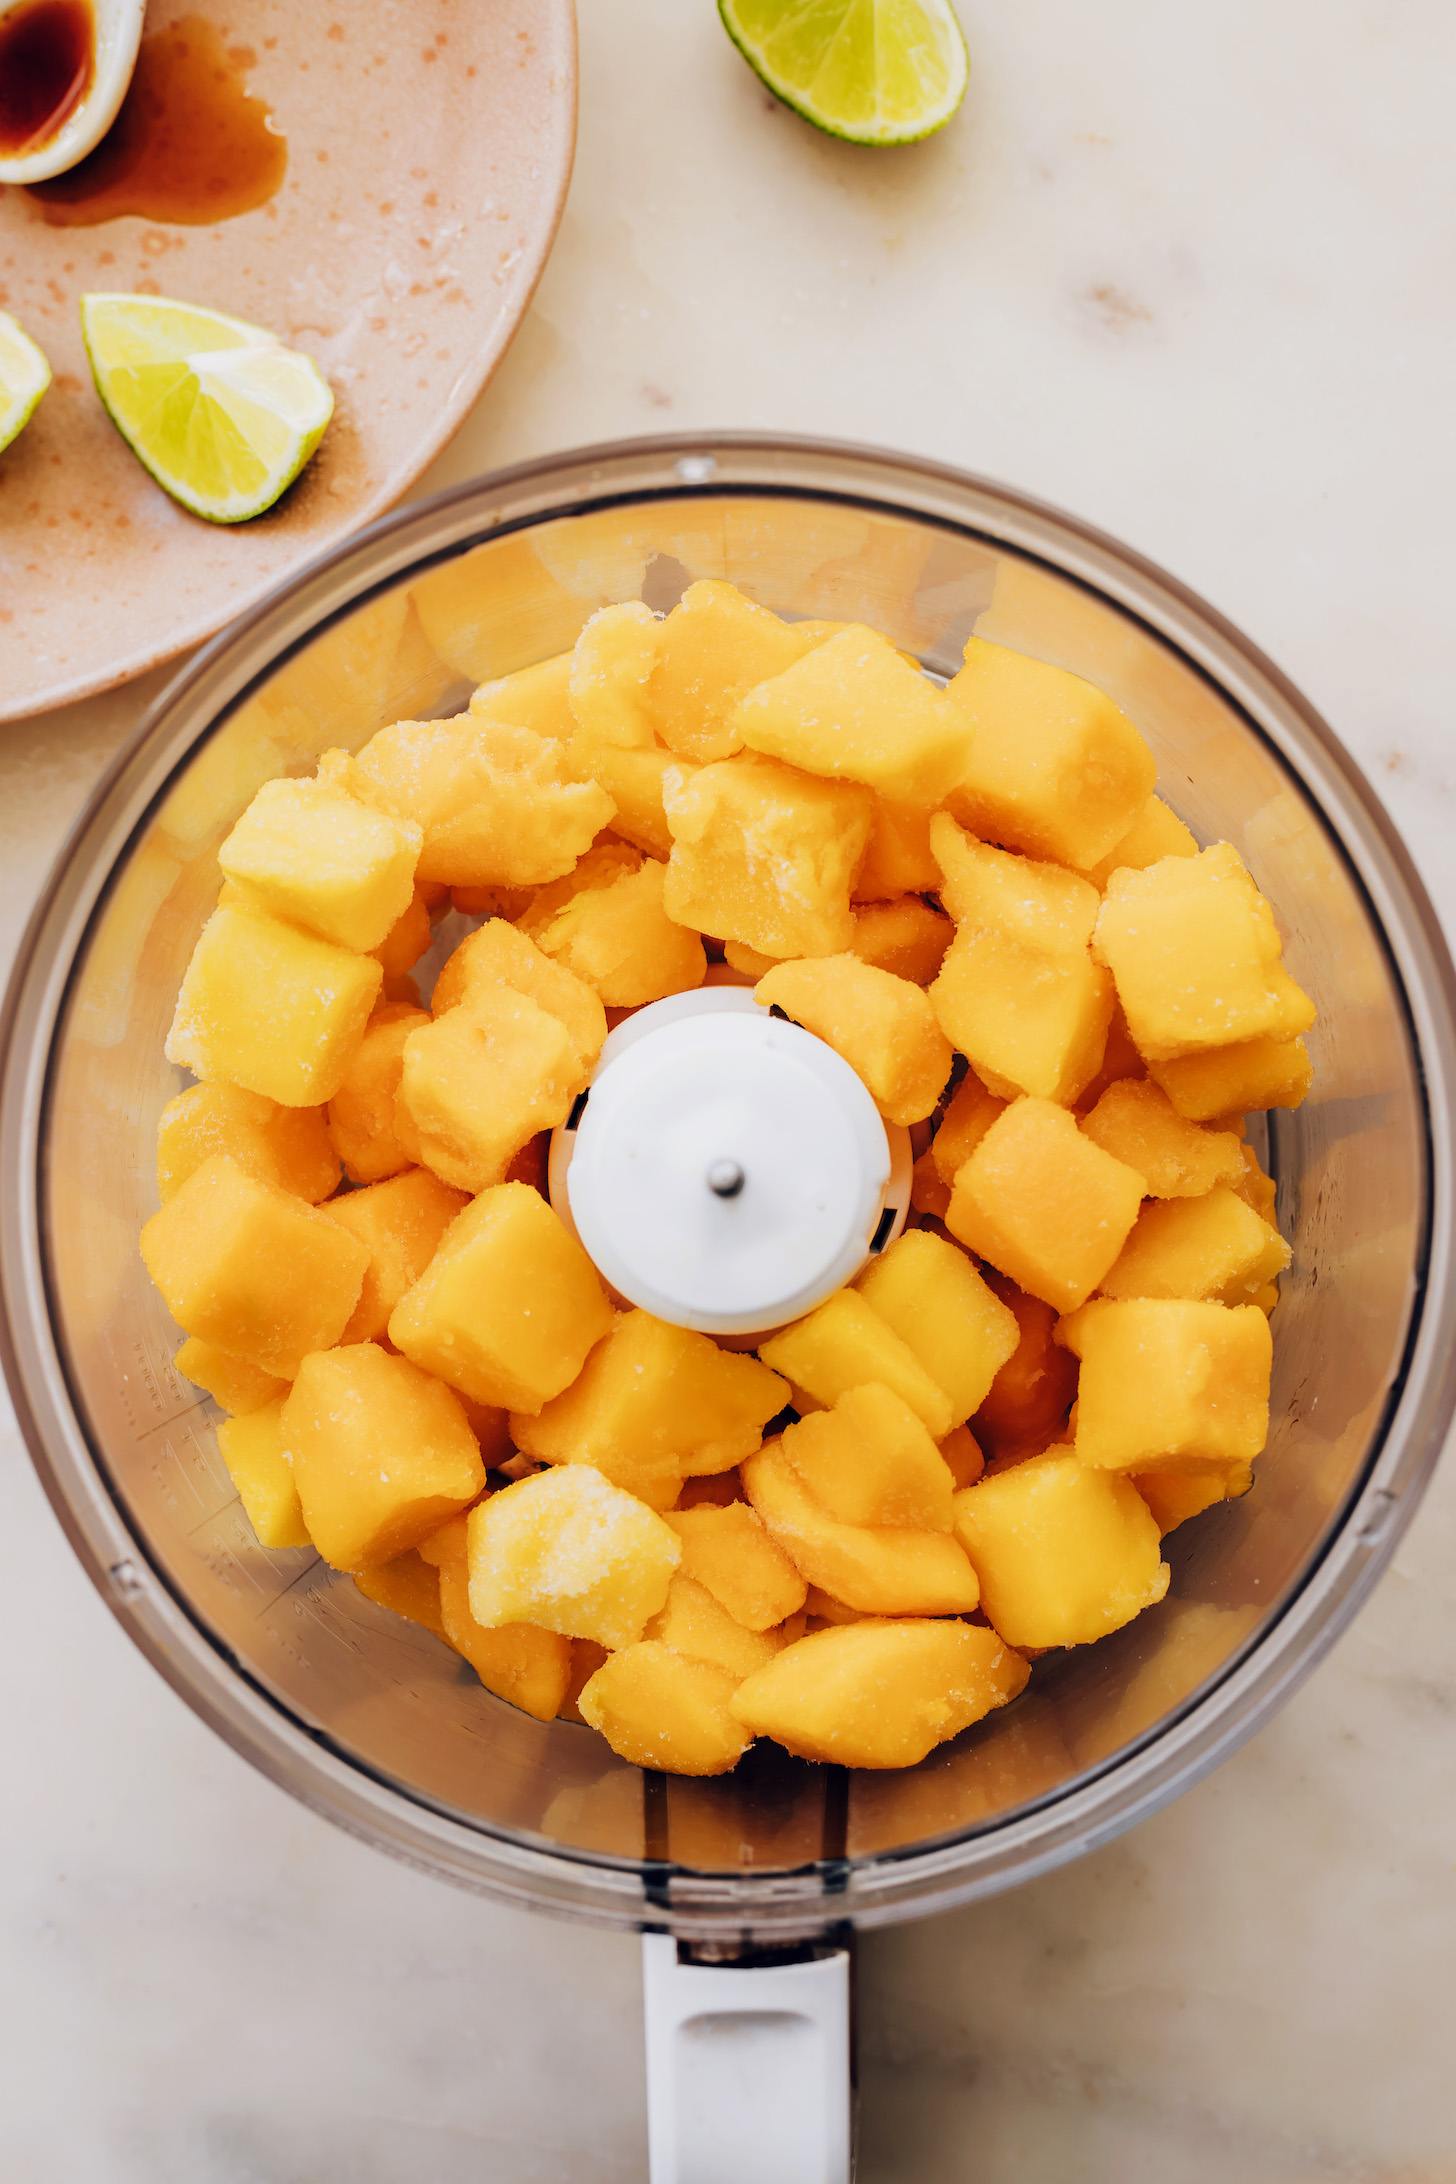 Frozen mango chunks in a food processor